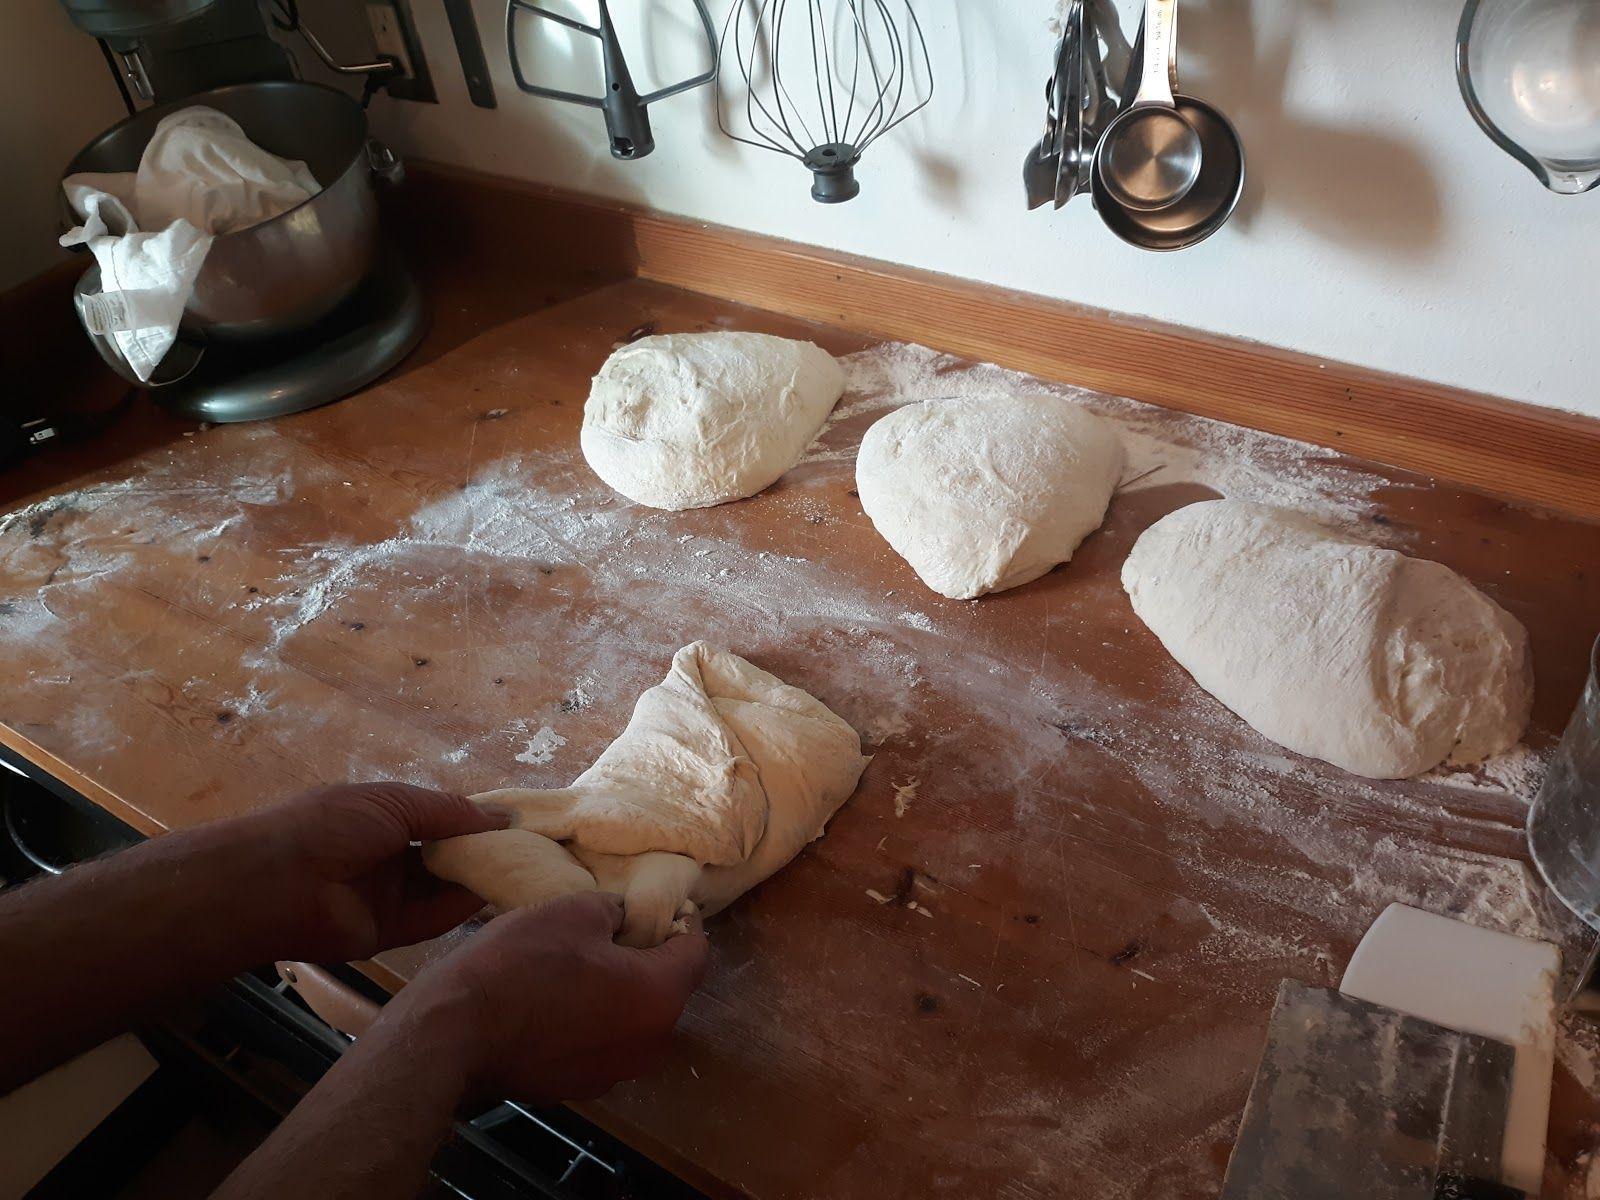 homemade bread instructions - Bozeman, Montana